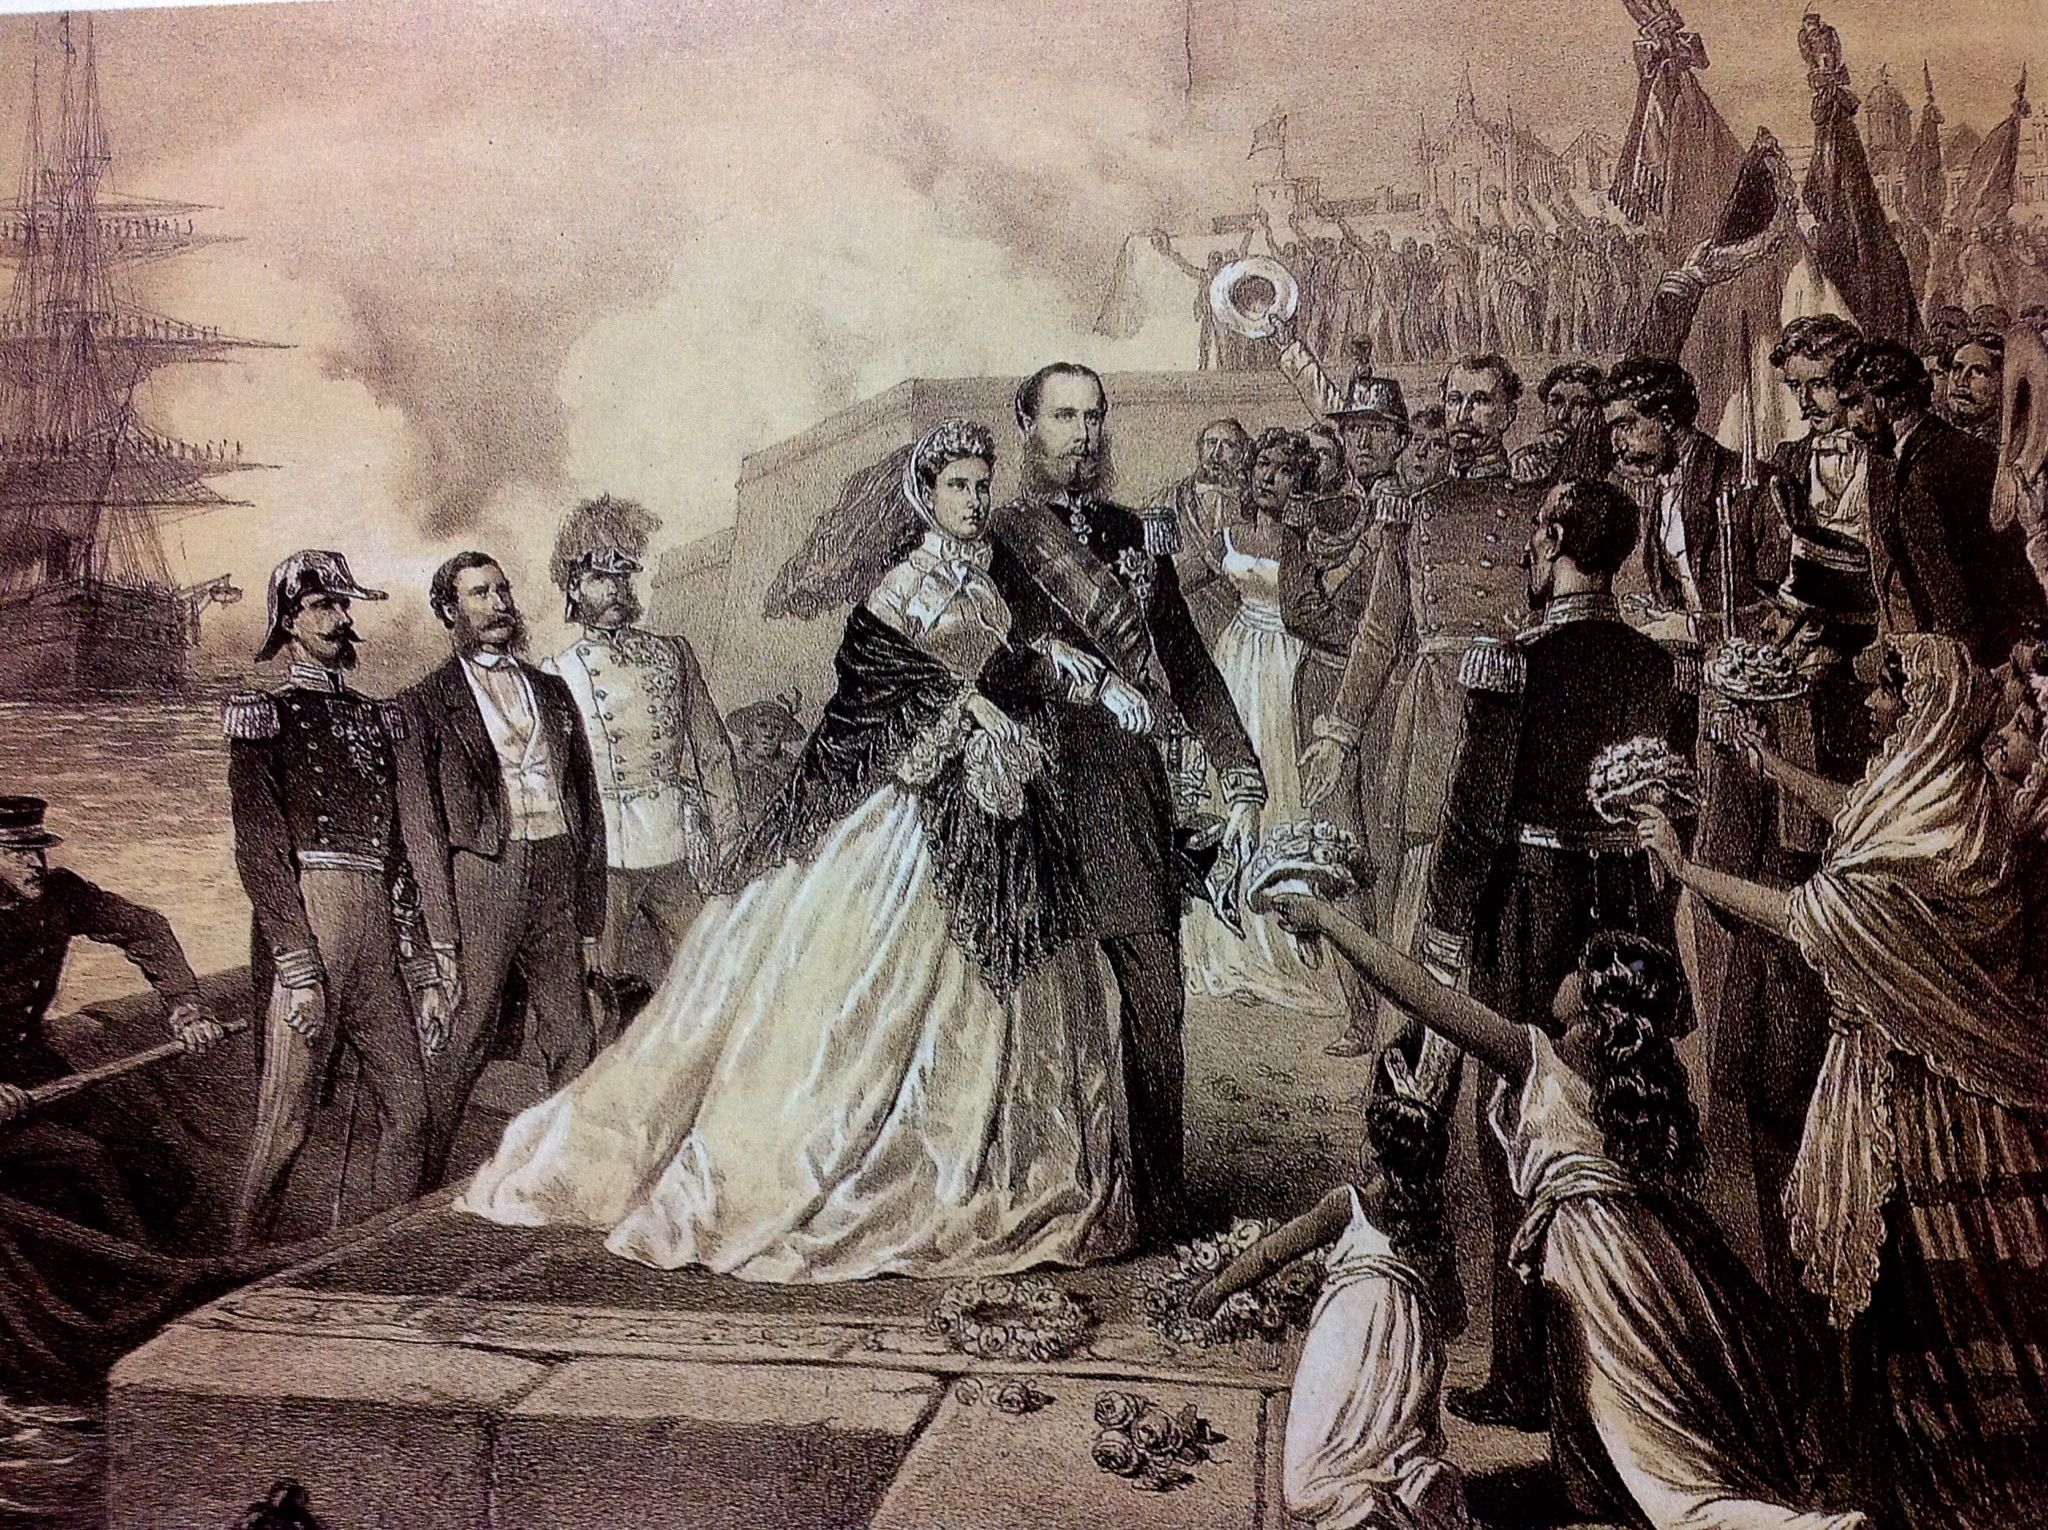 llegada de Maximiliano de Habsgurgo a México